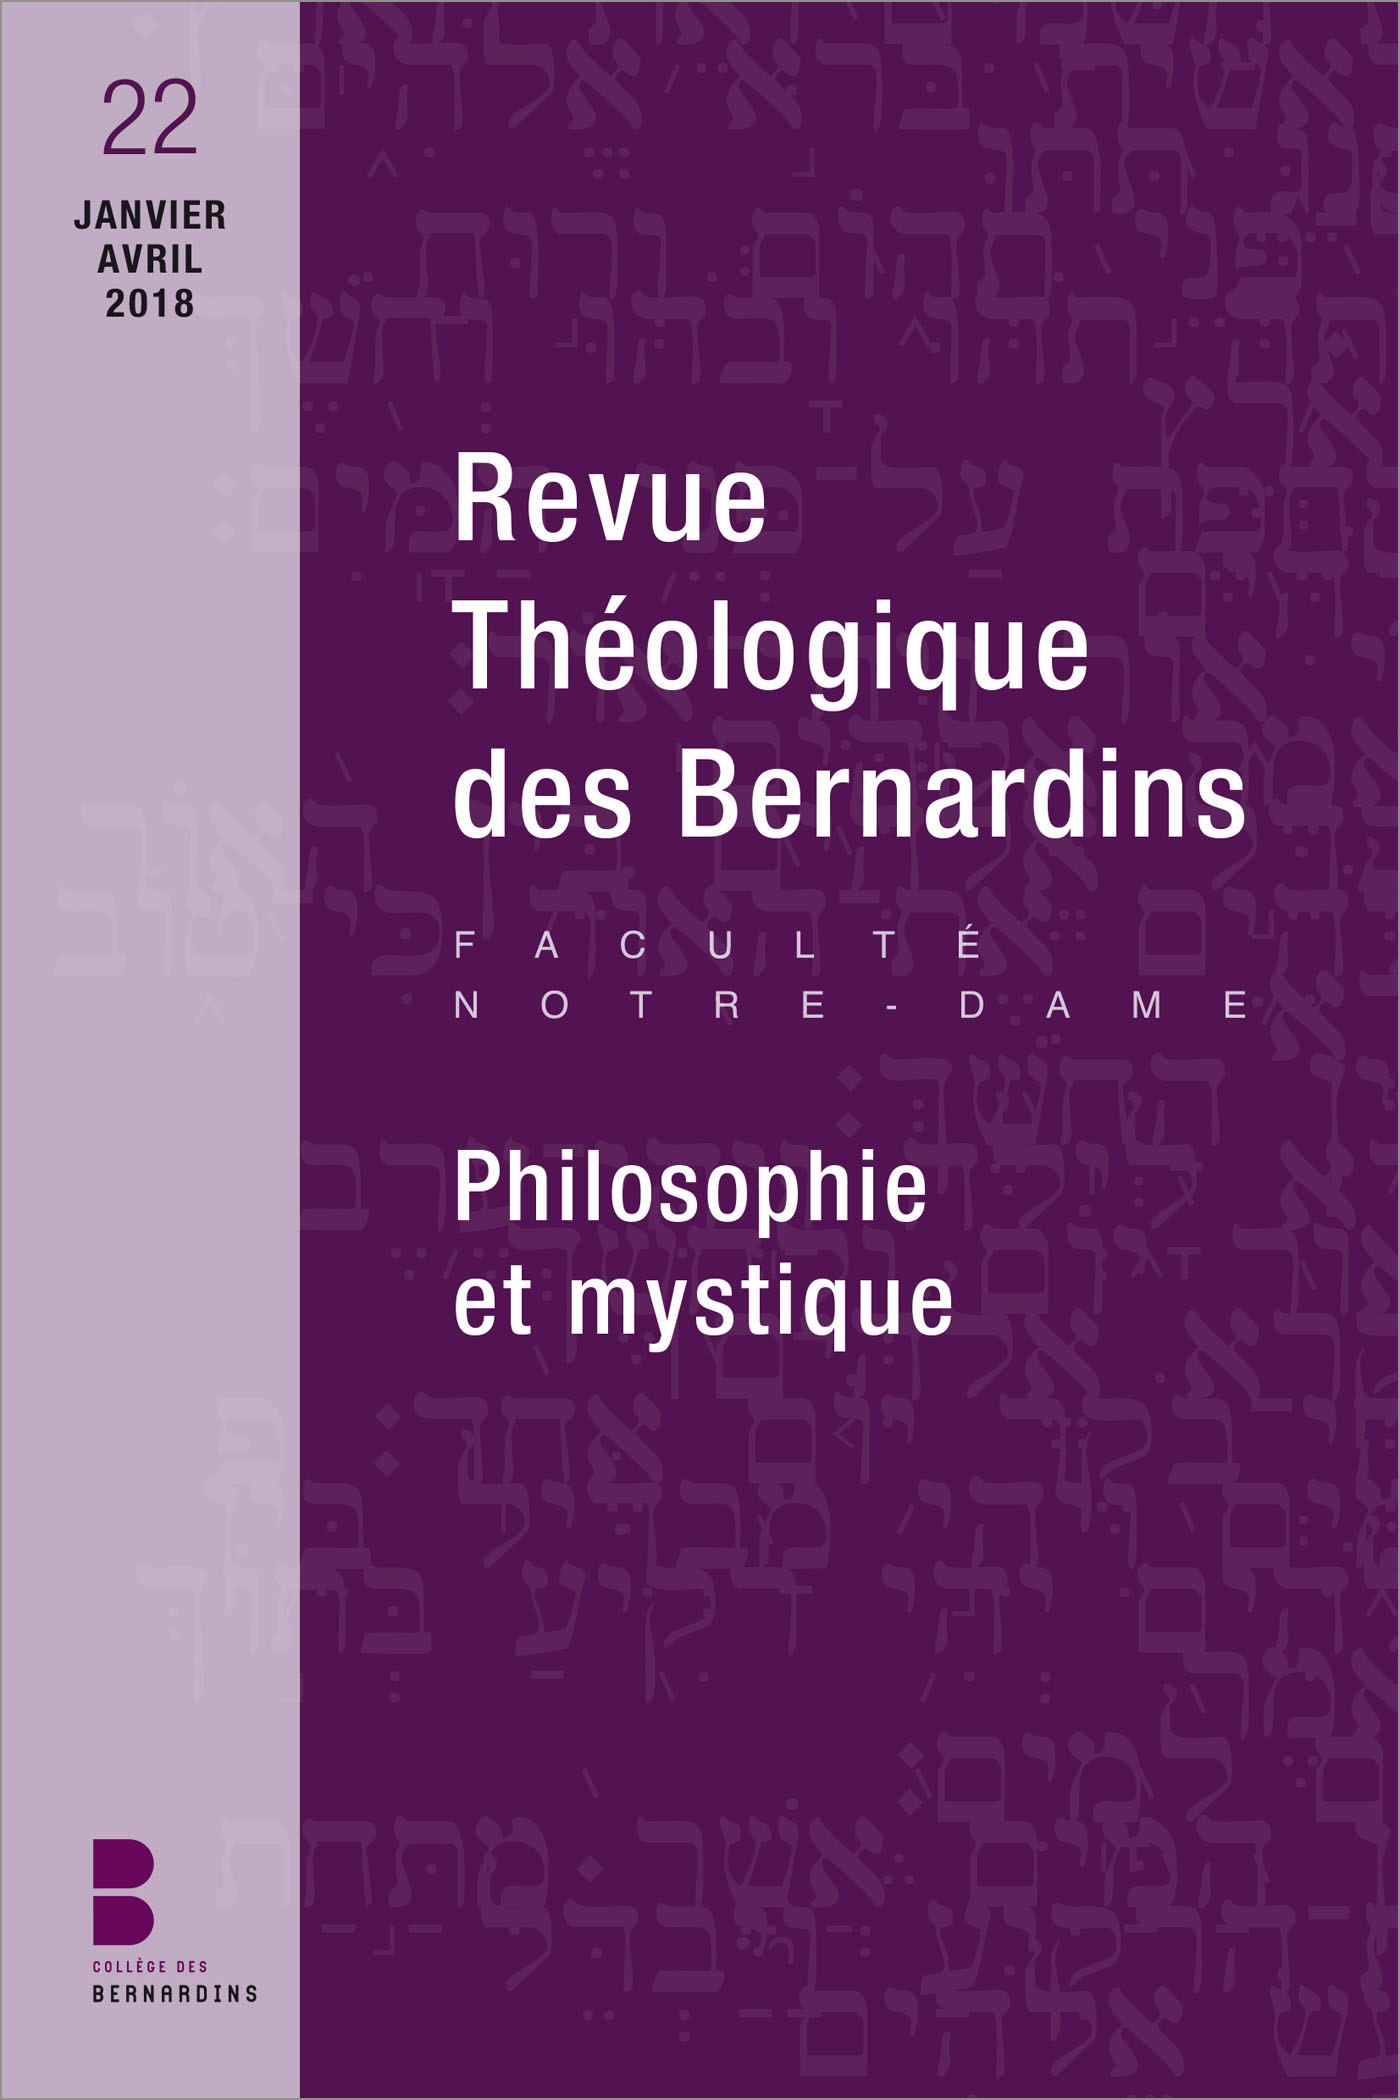 Revue théologique des Bernardins n. 22